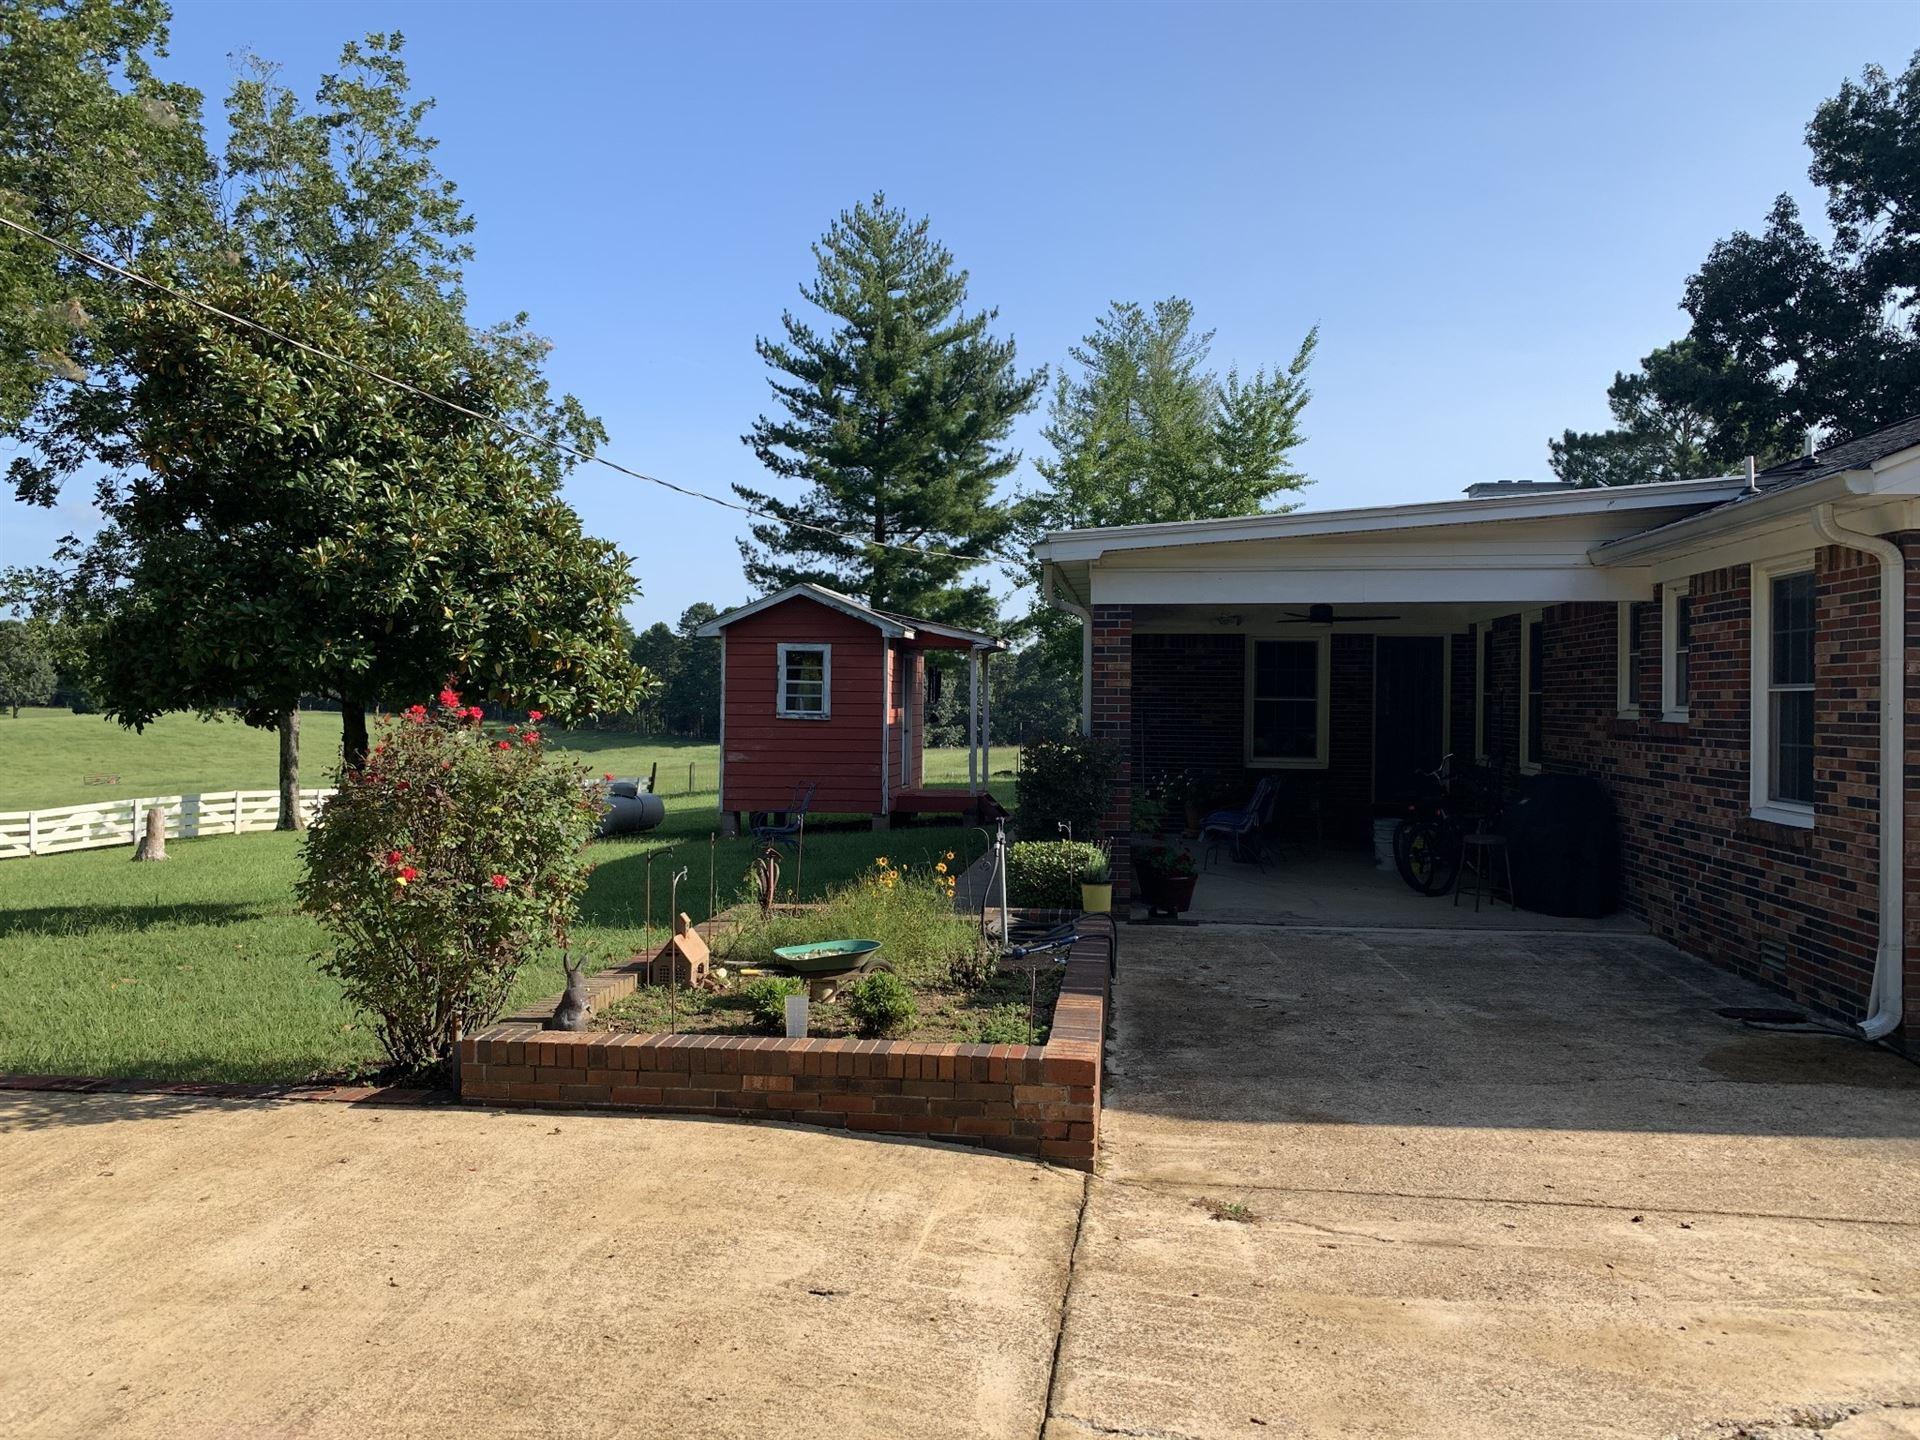 Photo of 3780 Bethesda Rd, Selmer, TN 38375 (MLS # 2193719)